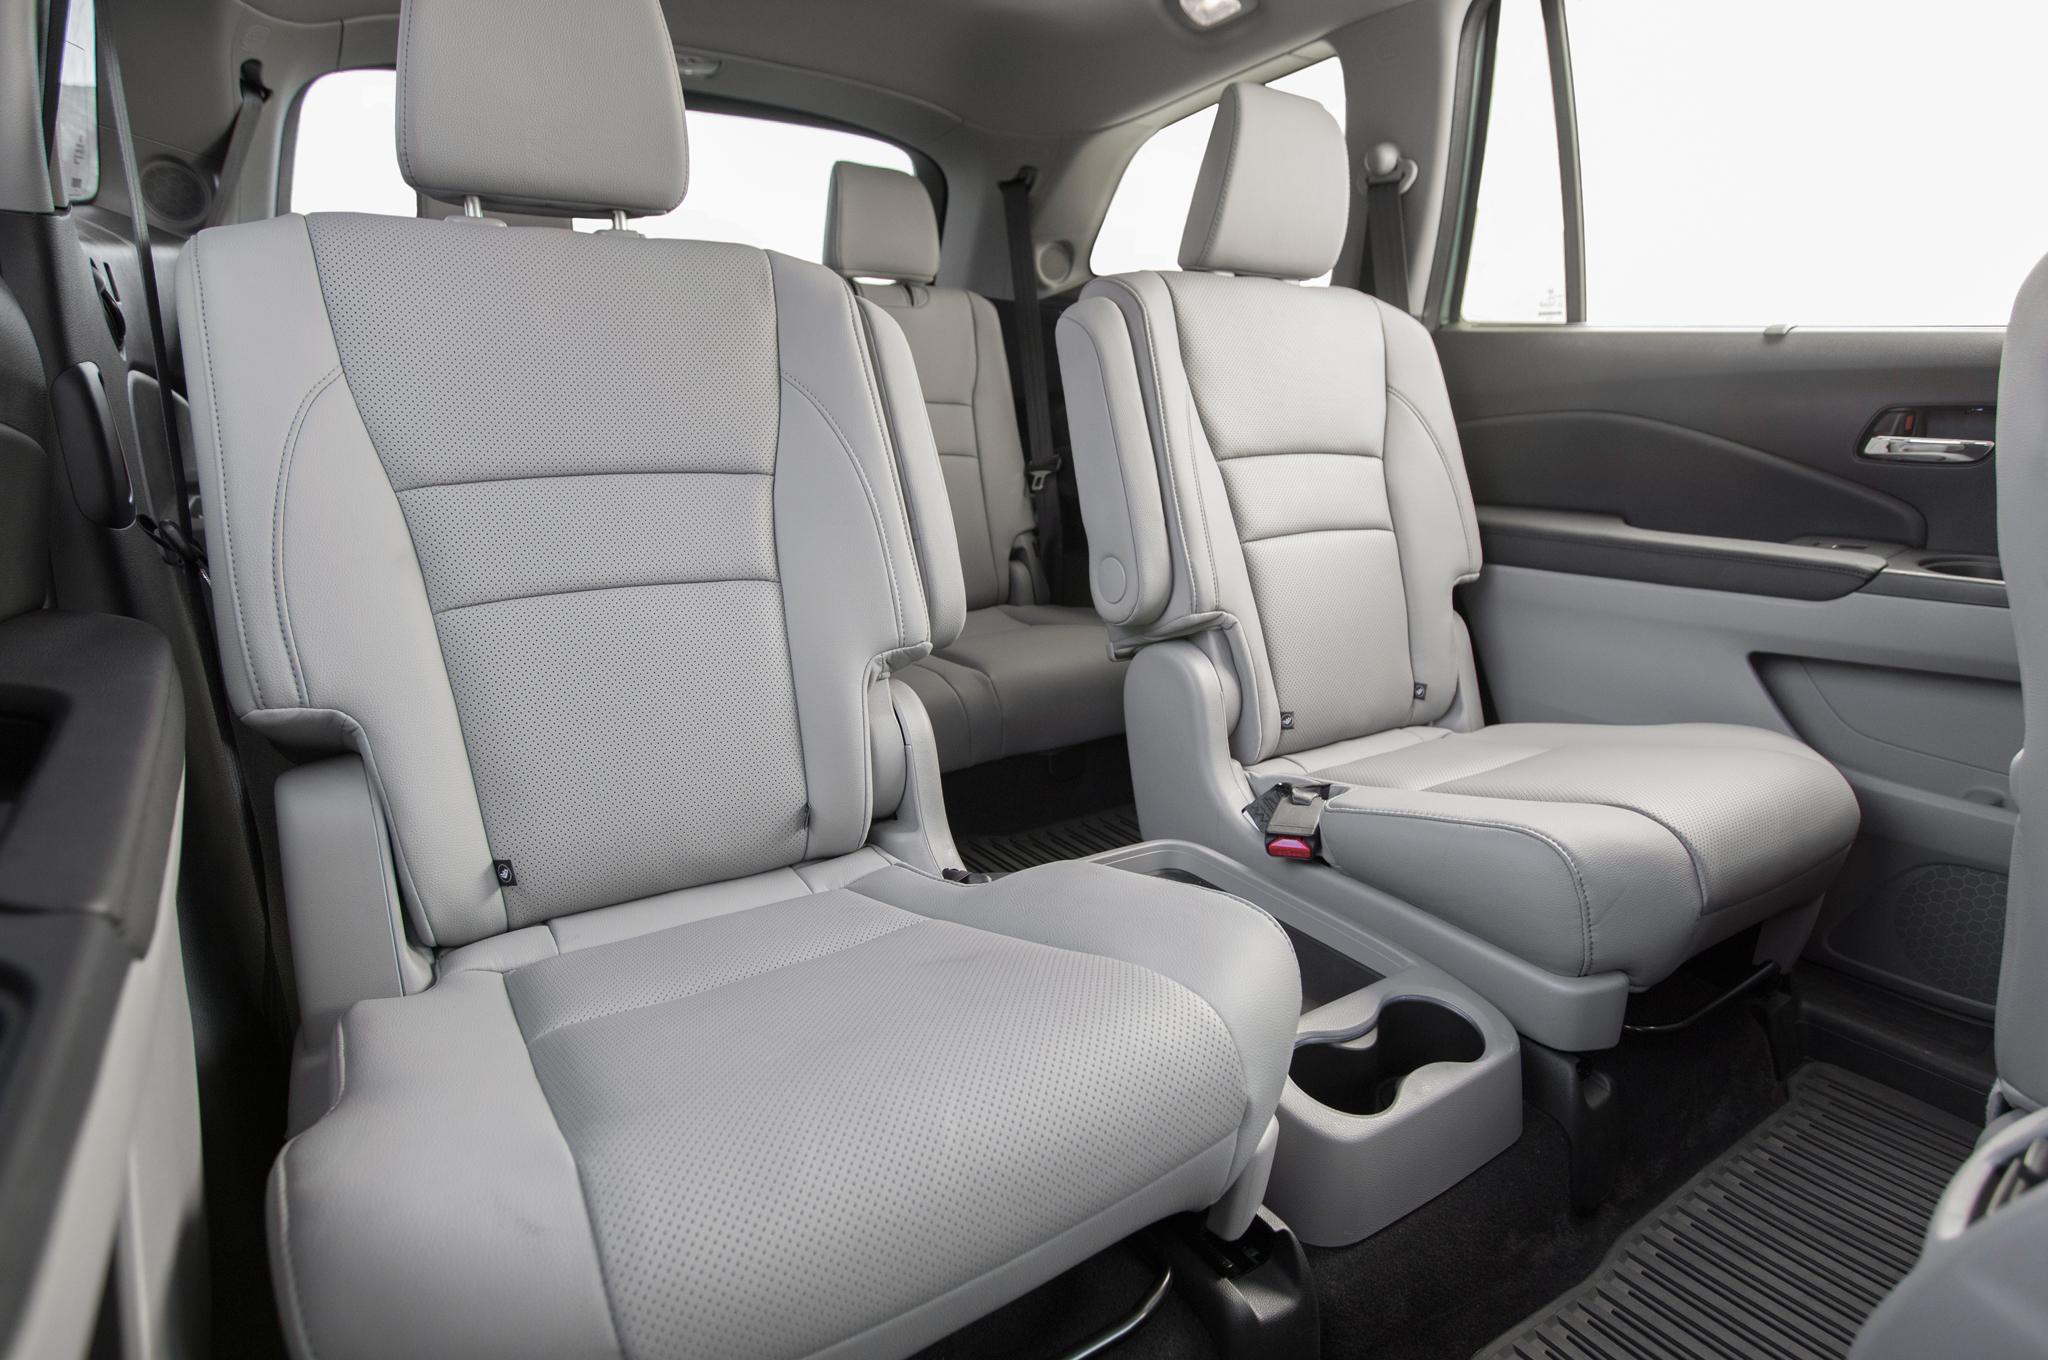 2016 Honda Pilot Elite Is Your Mobile Family Command